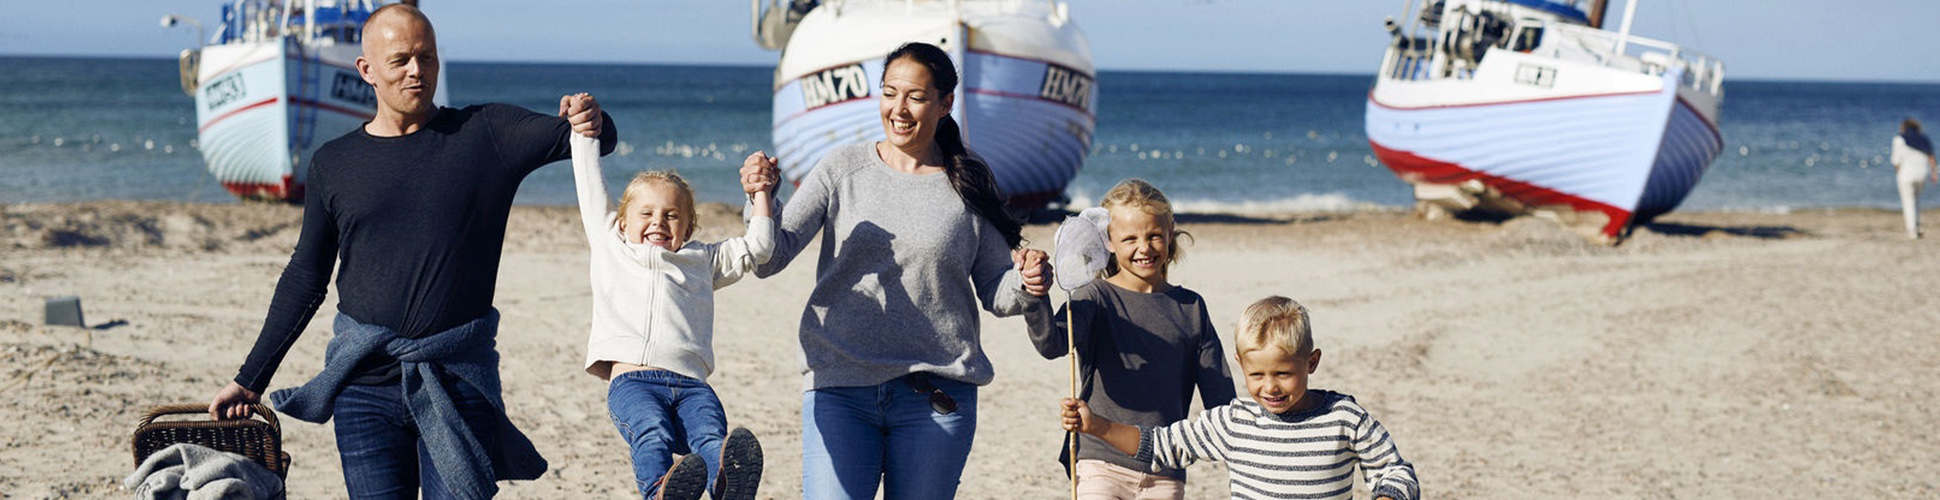 Familie im Dänemark Urlaub